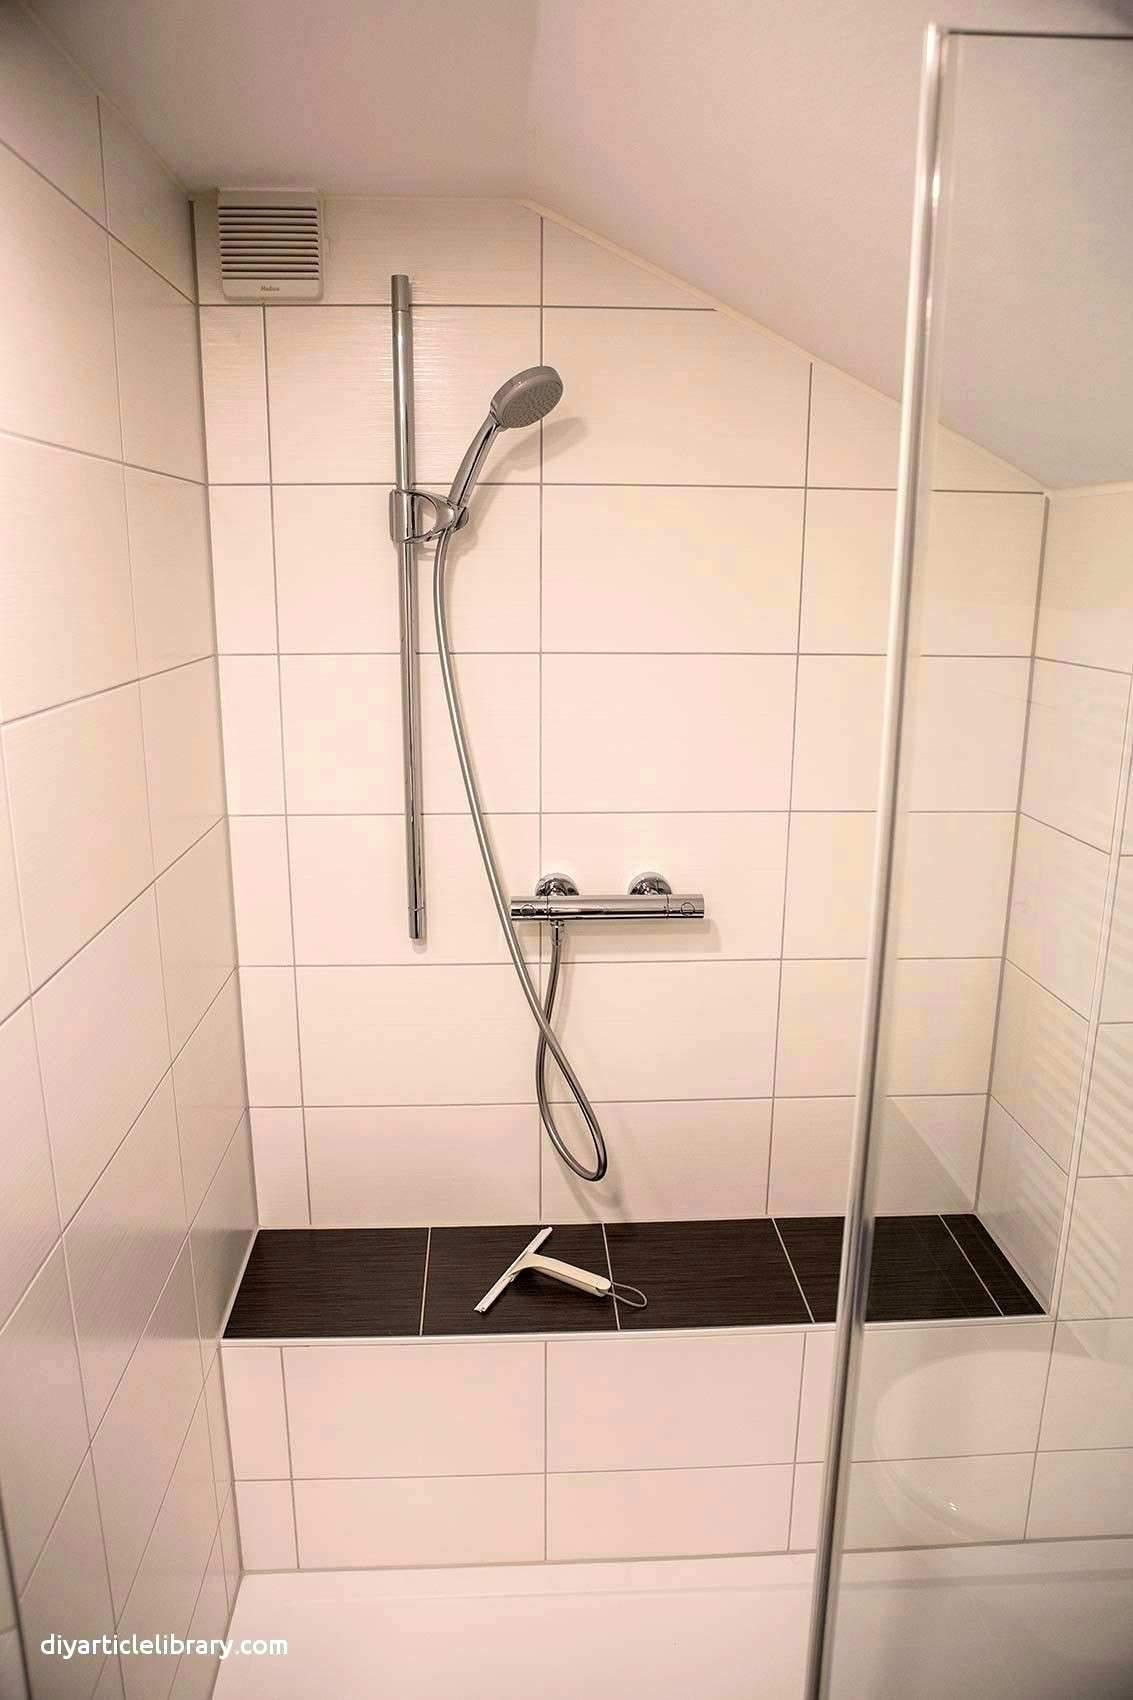 badezimmer fliesen ideen luxus pvc im bad inspirierend pvc boden pvc badezimmer 0d of badezimmer fliesen ideen